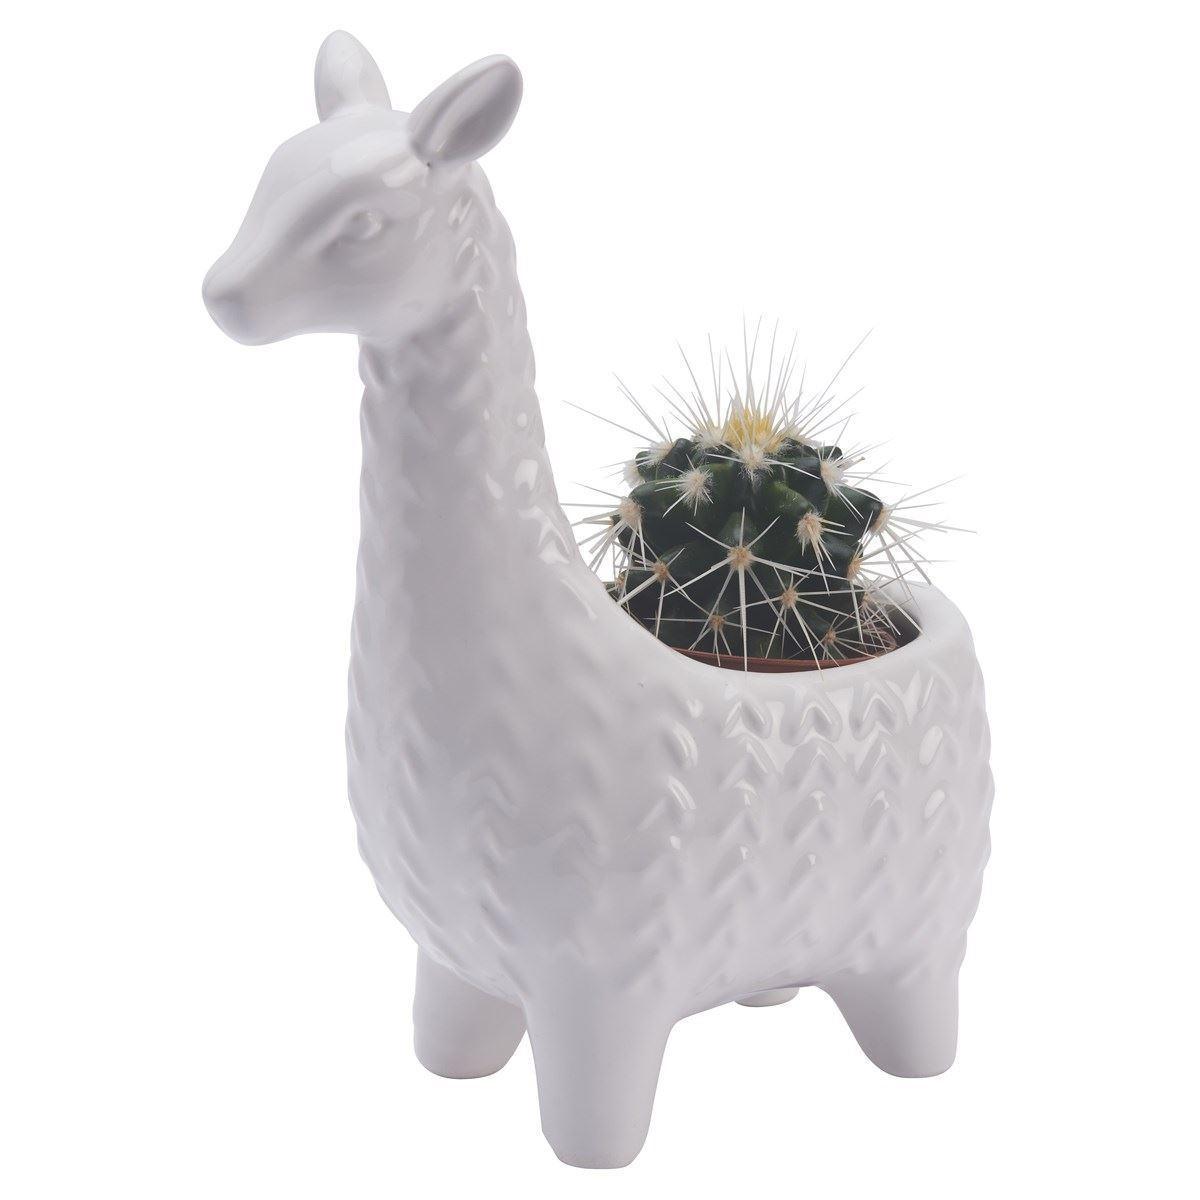 Llama Planter image